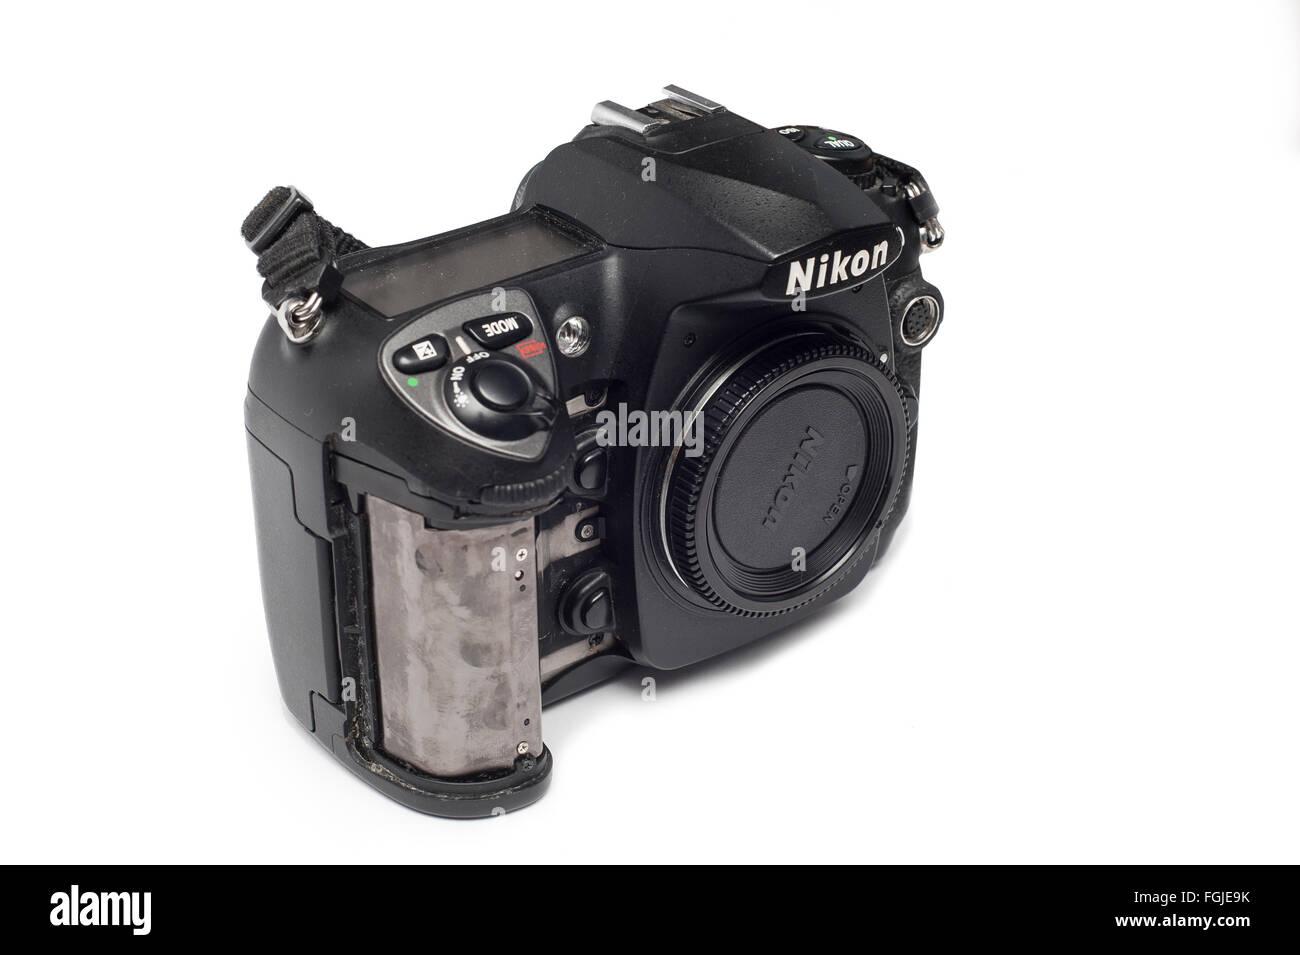 Pavlograd, Donetsk - Januart 27, 2015: Nikon D200 DSLR  DSLR Camera with loose rubber. Isolated on white background - Stock Image